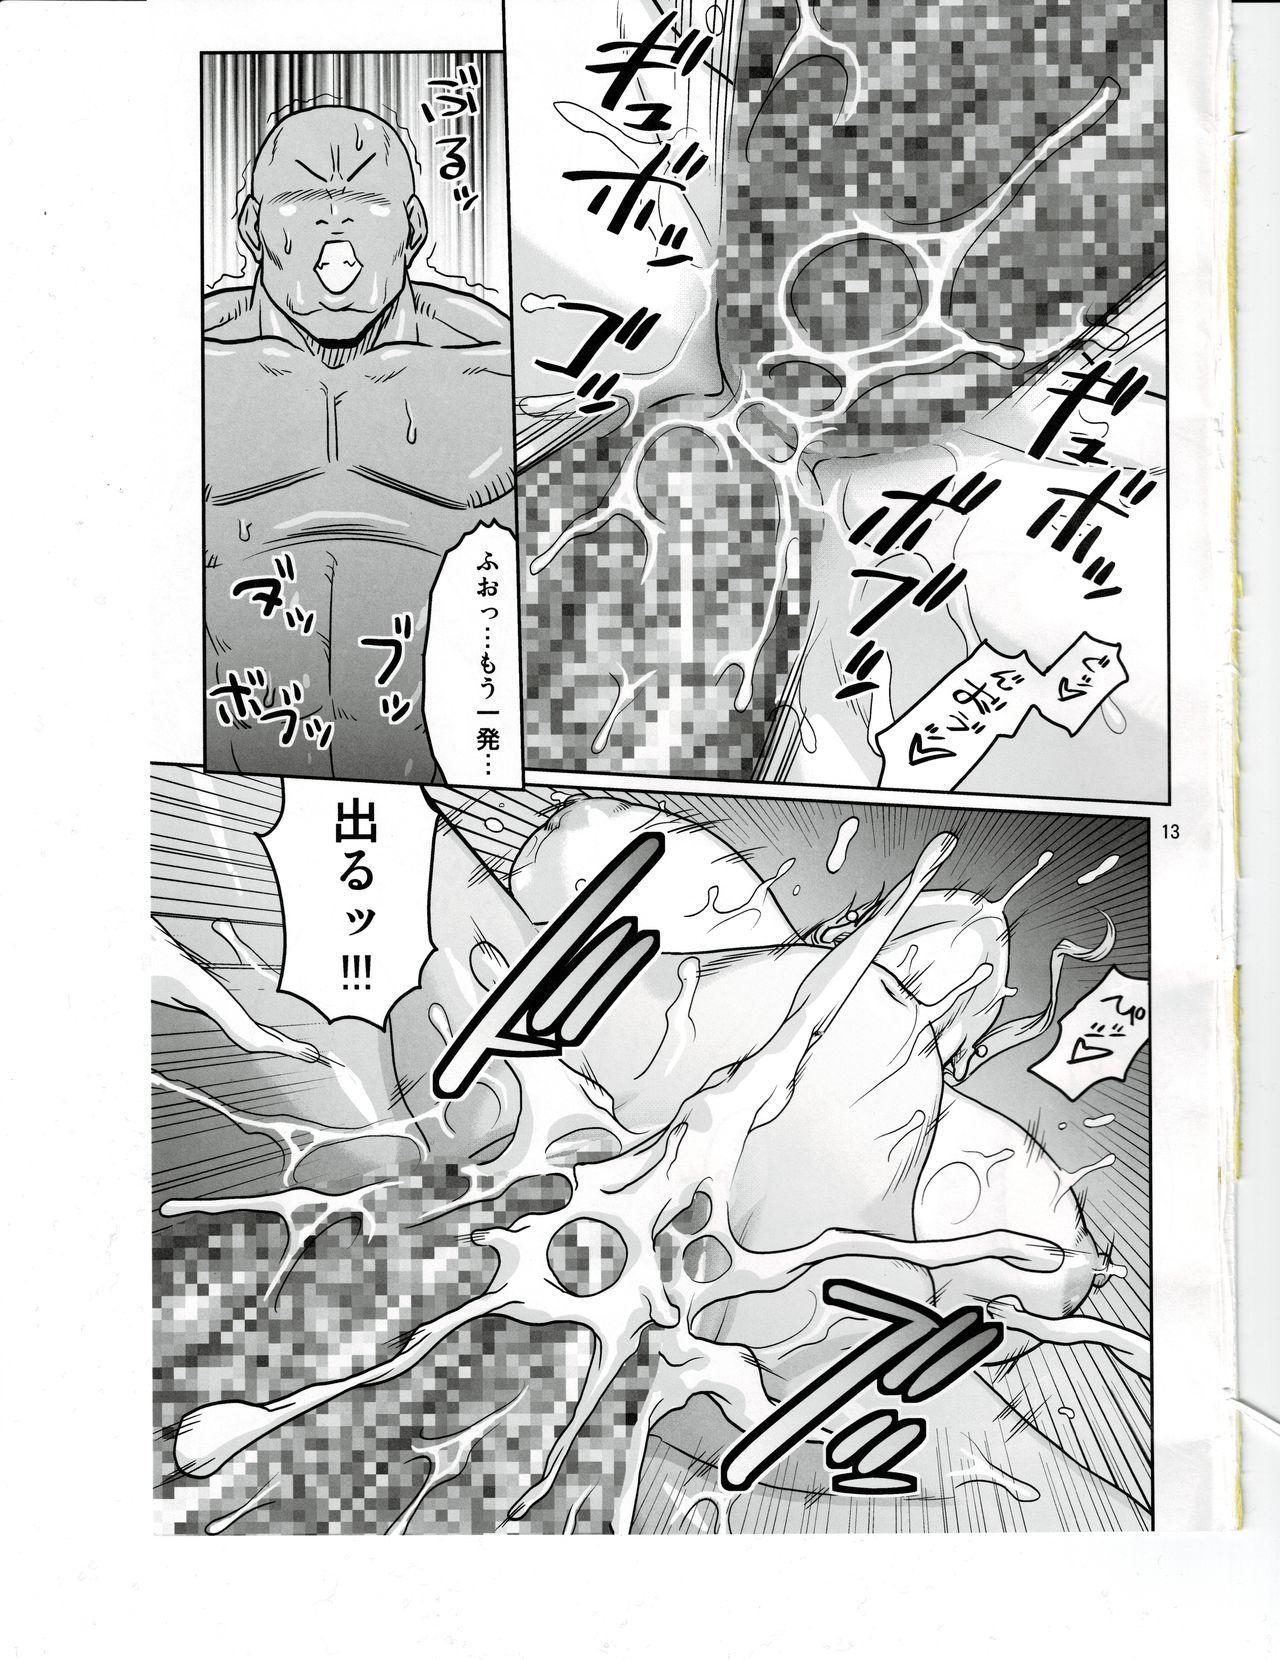 Nami Ura 16 Nami-san VS Shokushu Danyuu 10